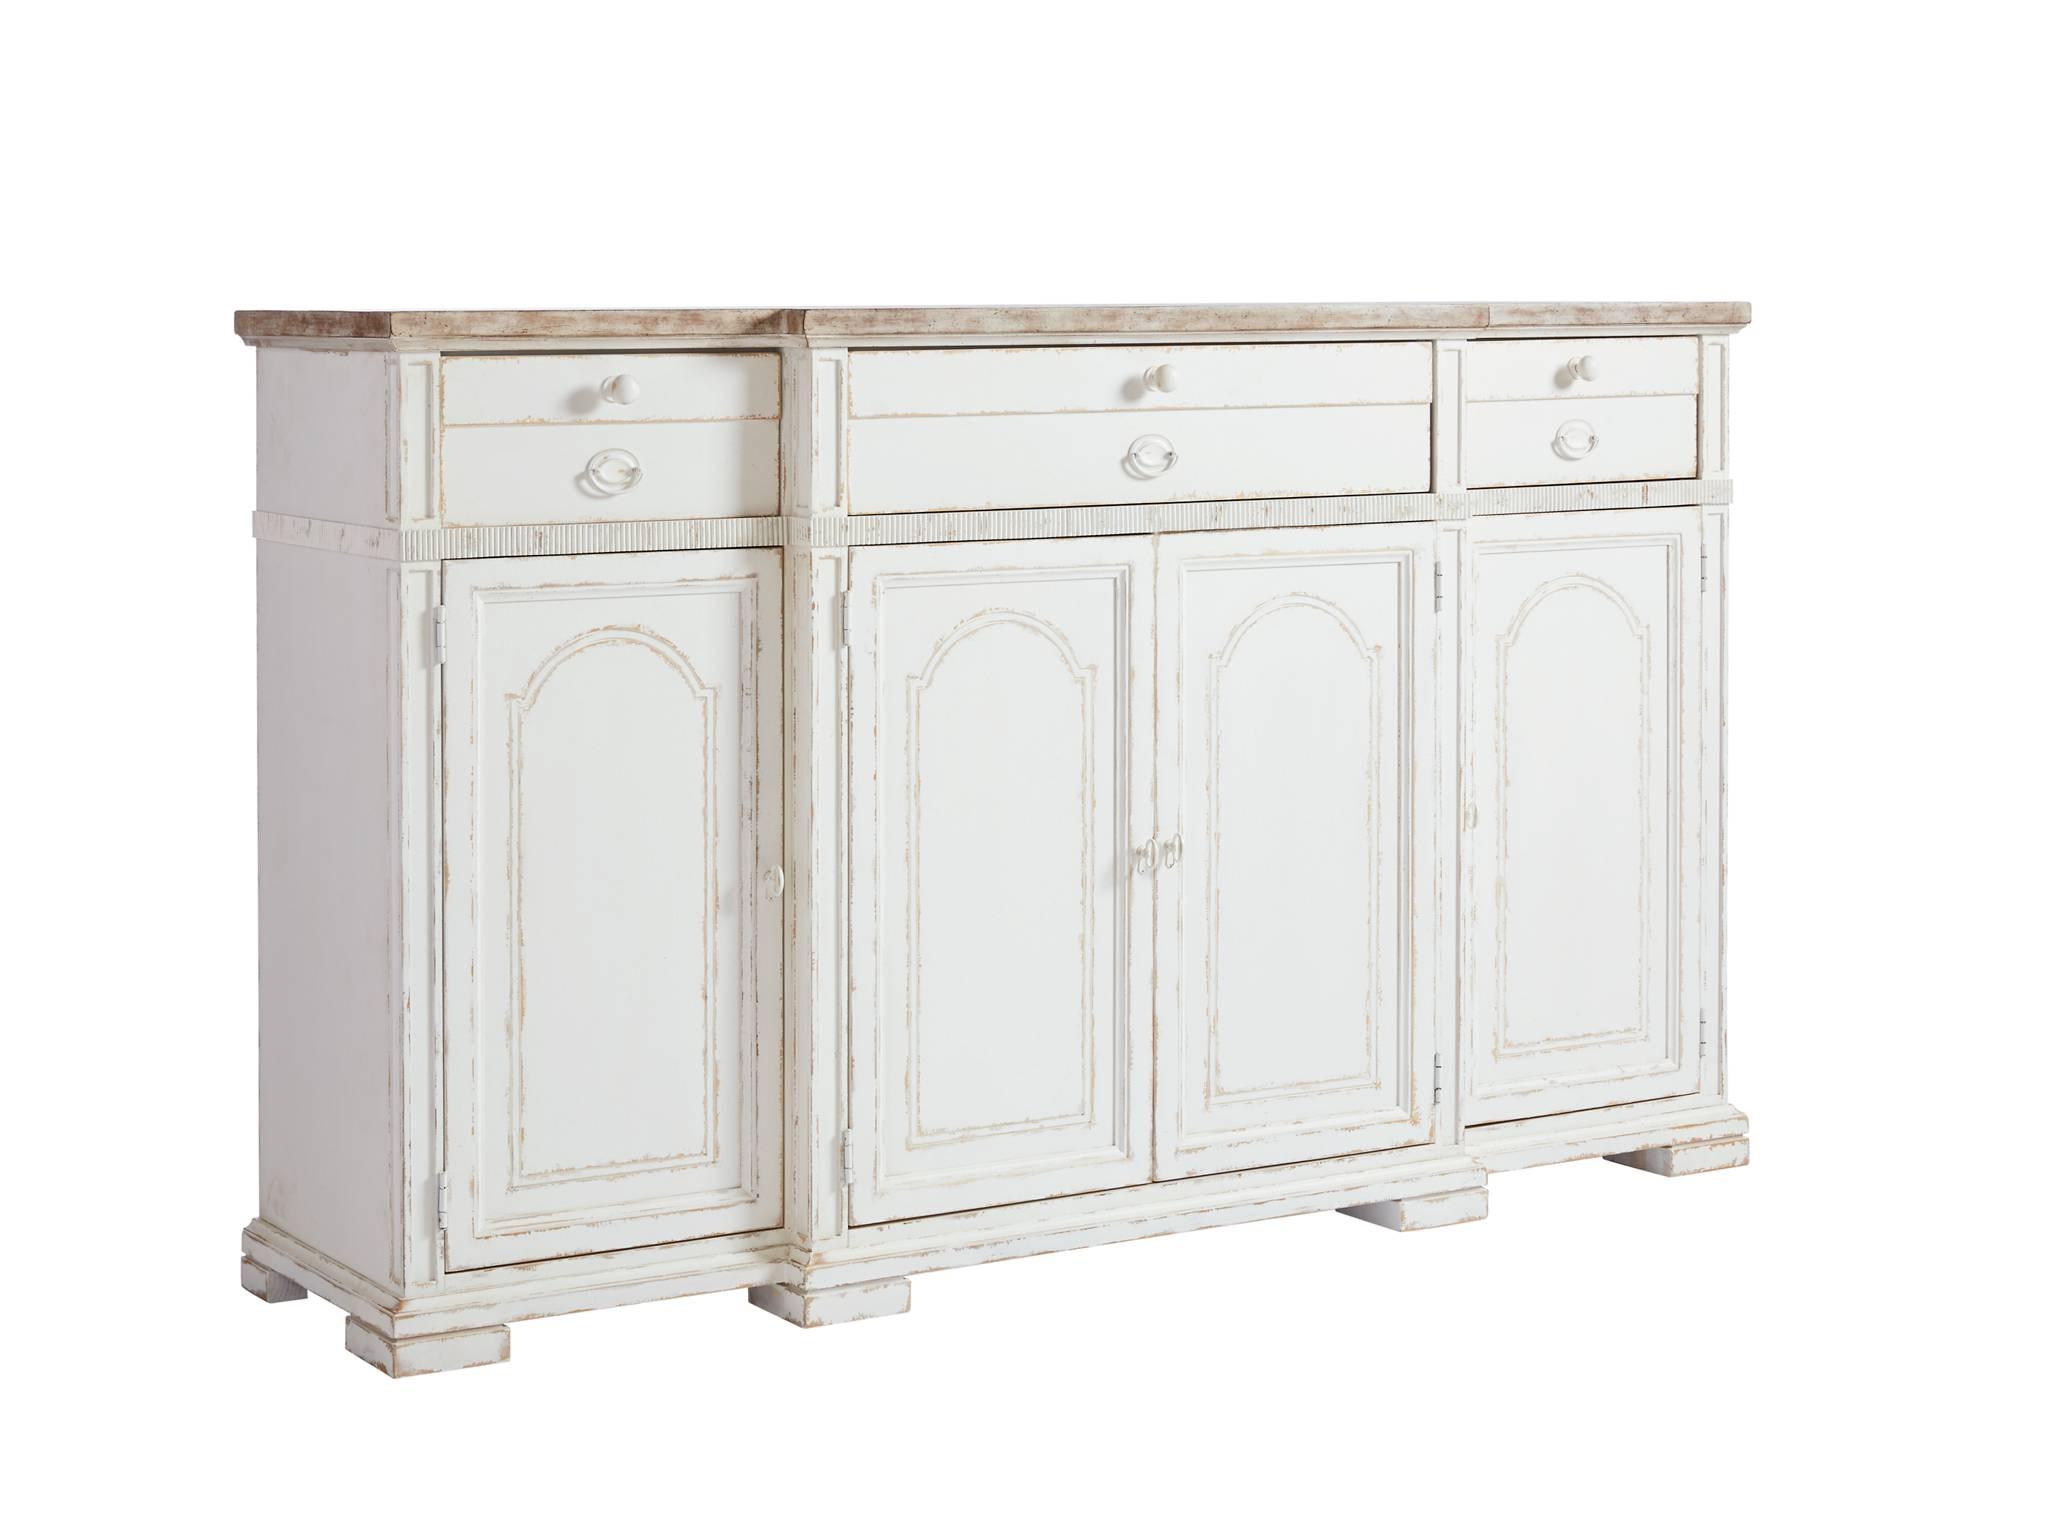 Stanley Furniture Buffet 615 21 05